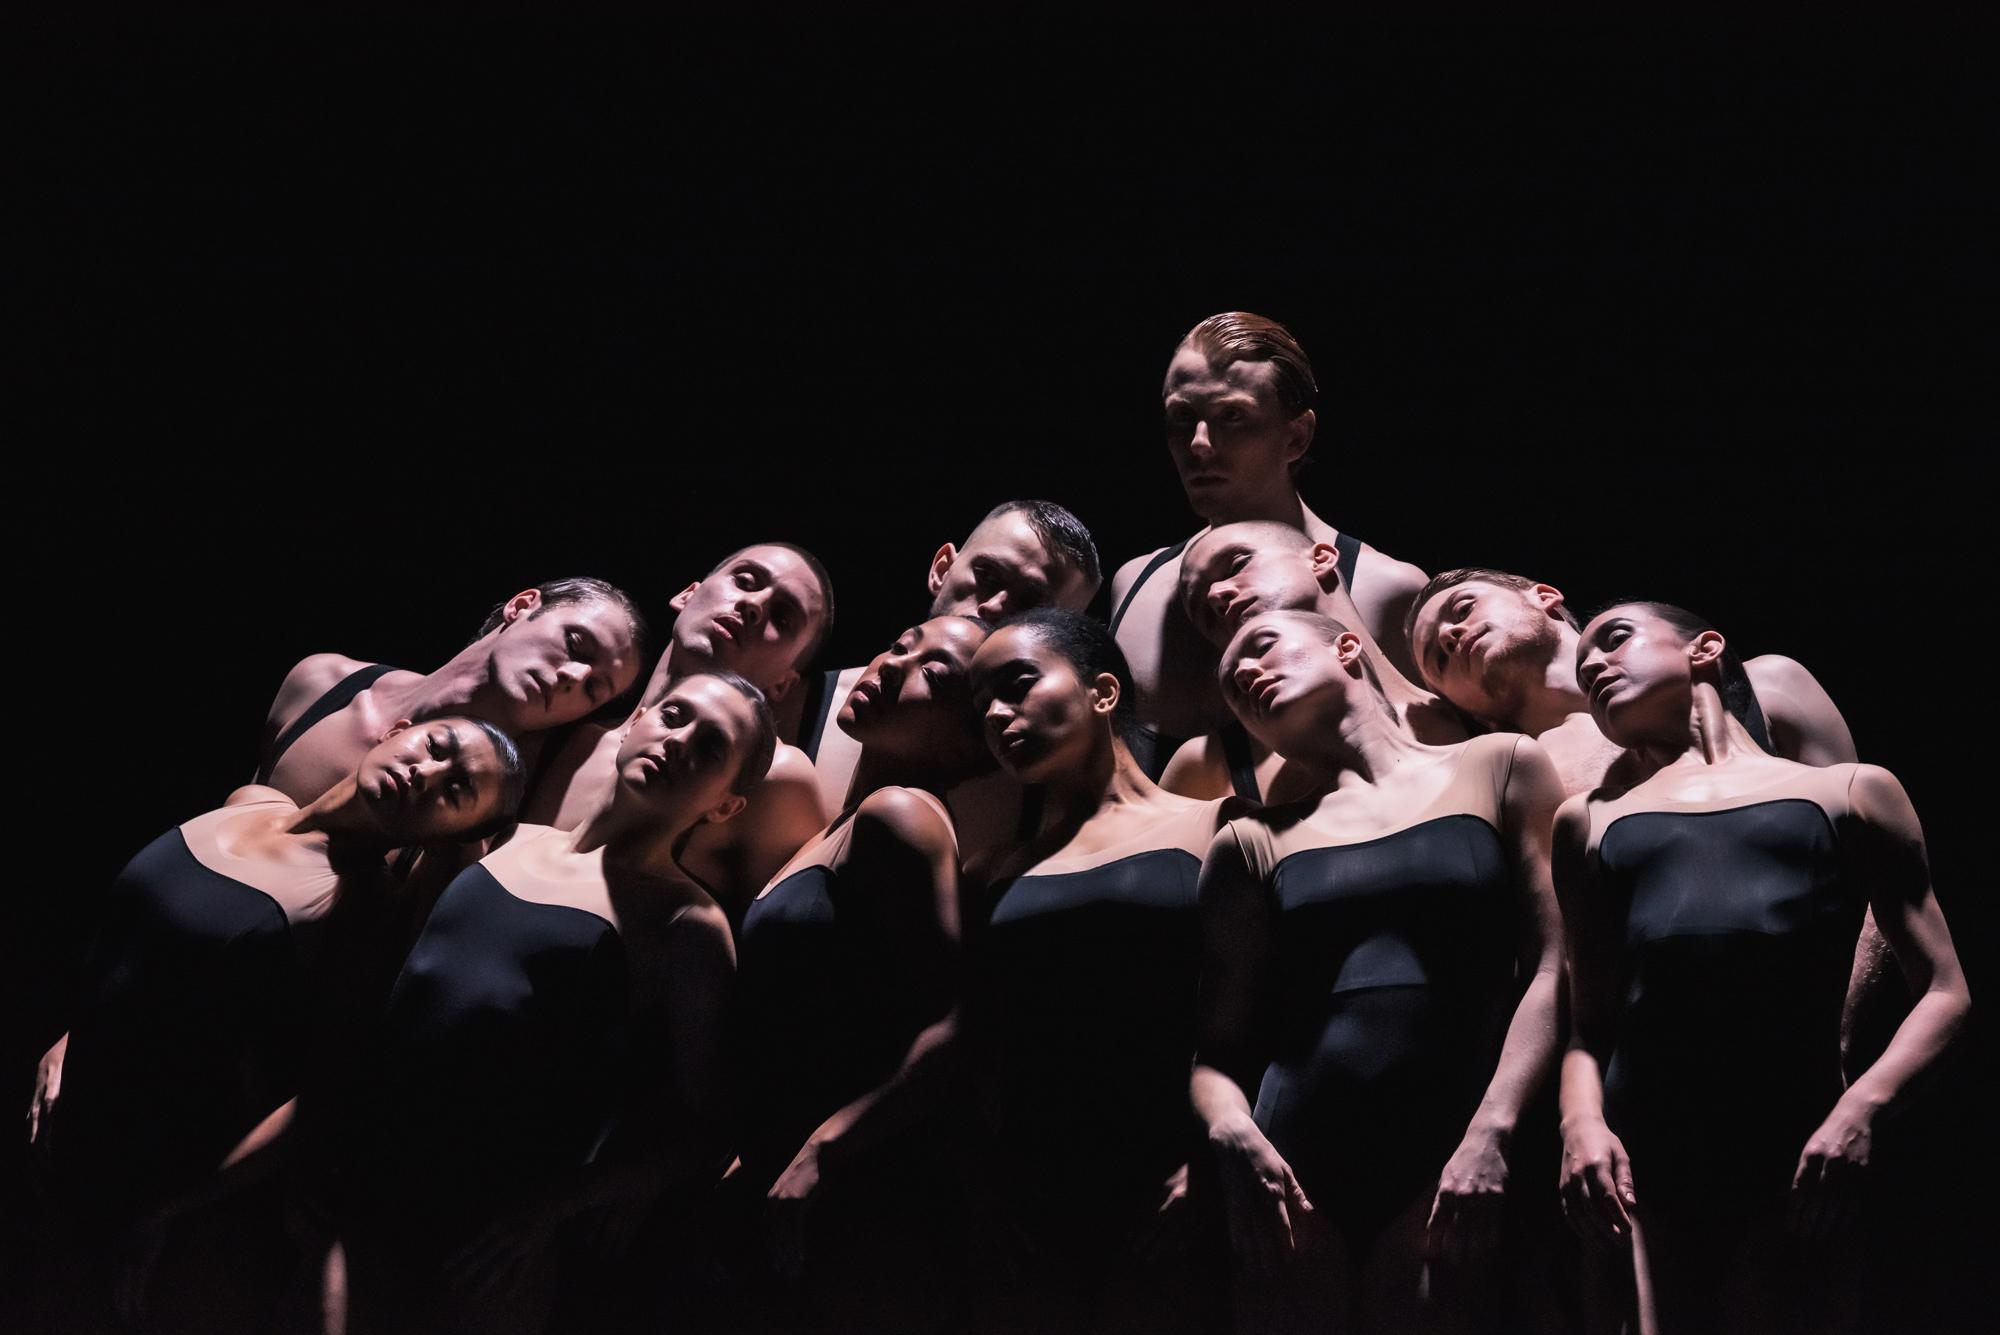 Artists of Ballet BC in Bedroom Folk, Sharon Eyal & Gai Behar. Image by Four Eyes Portraits.